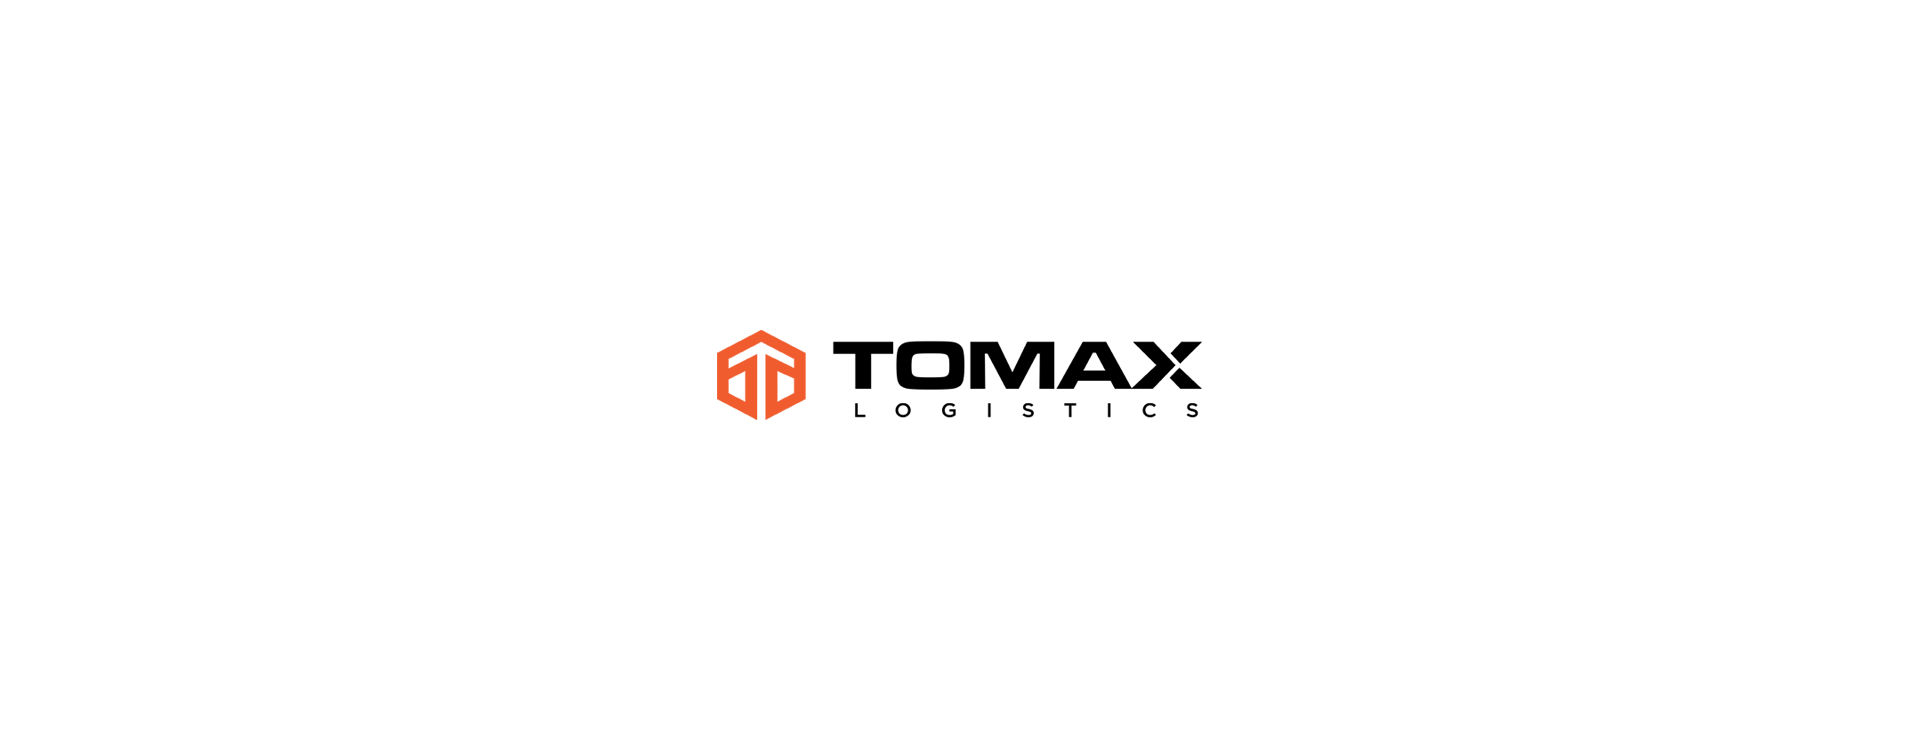 Tomax Logistics